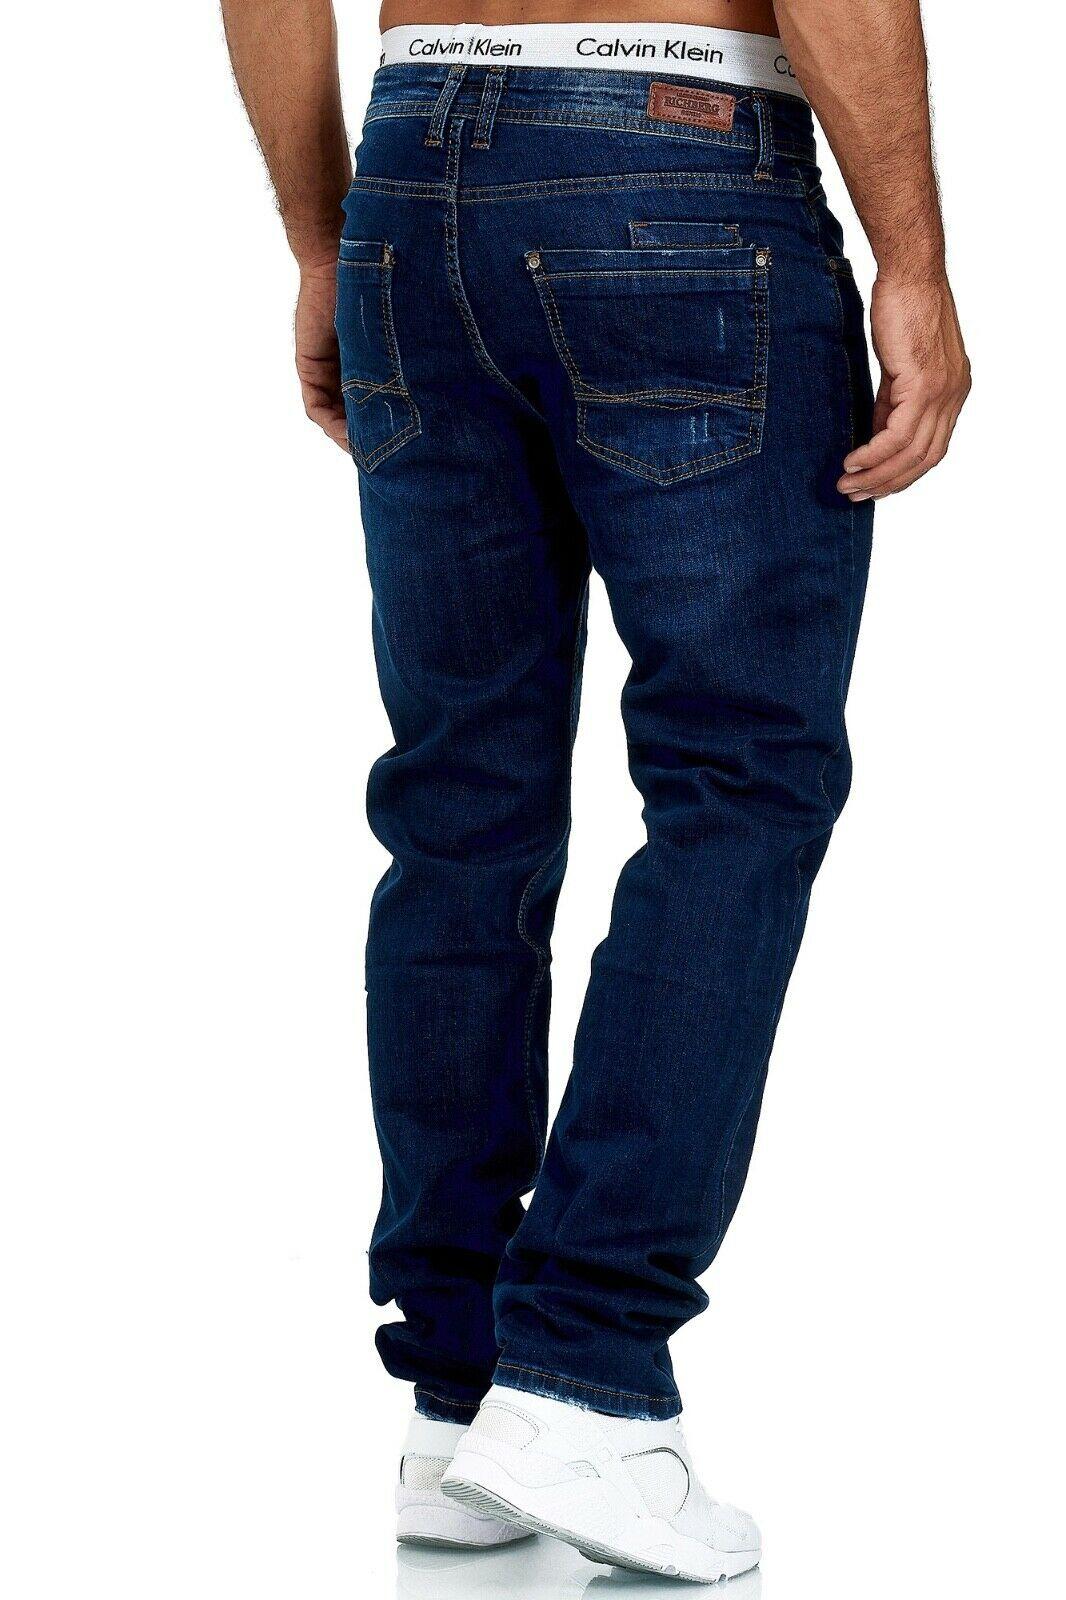 Herren-Jeans-Hose-Denim-KC-Black-Washed-Straight-Cut-Regular-Dicke-Naht-naehte Indexbild 69